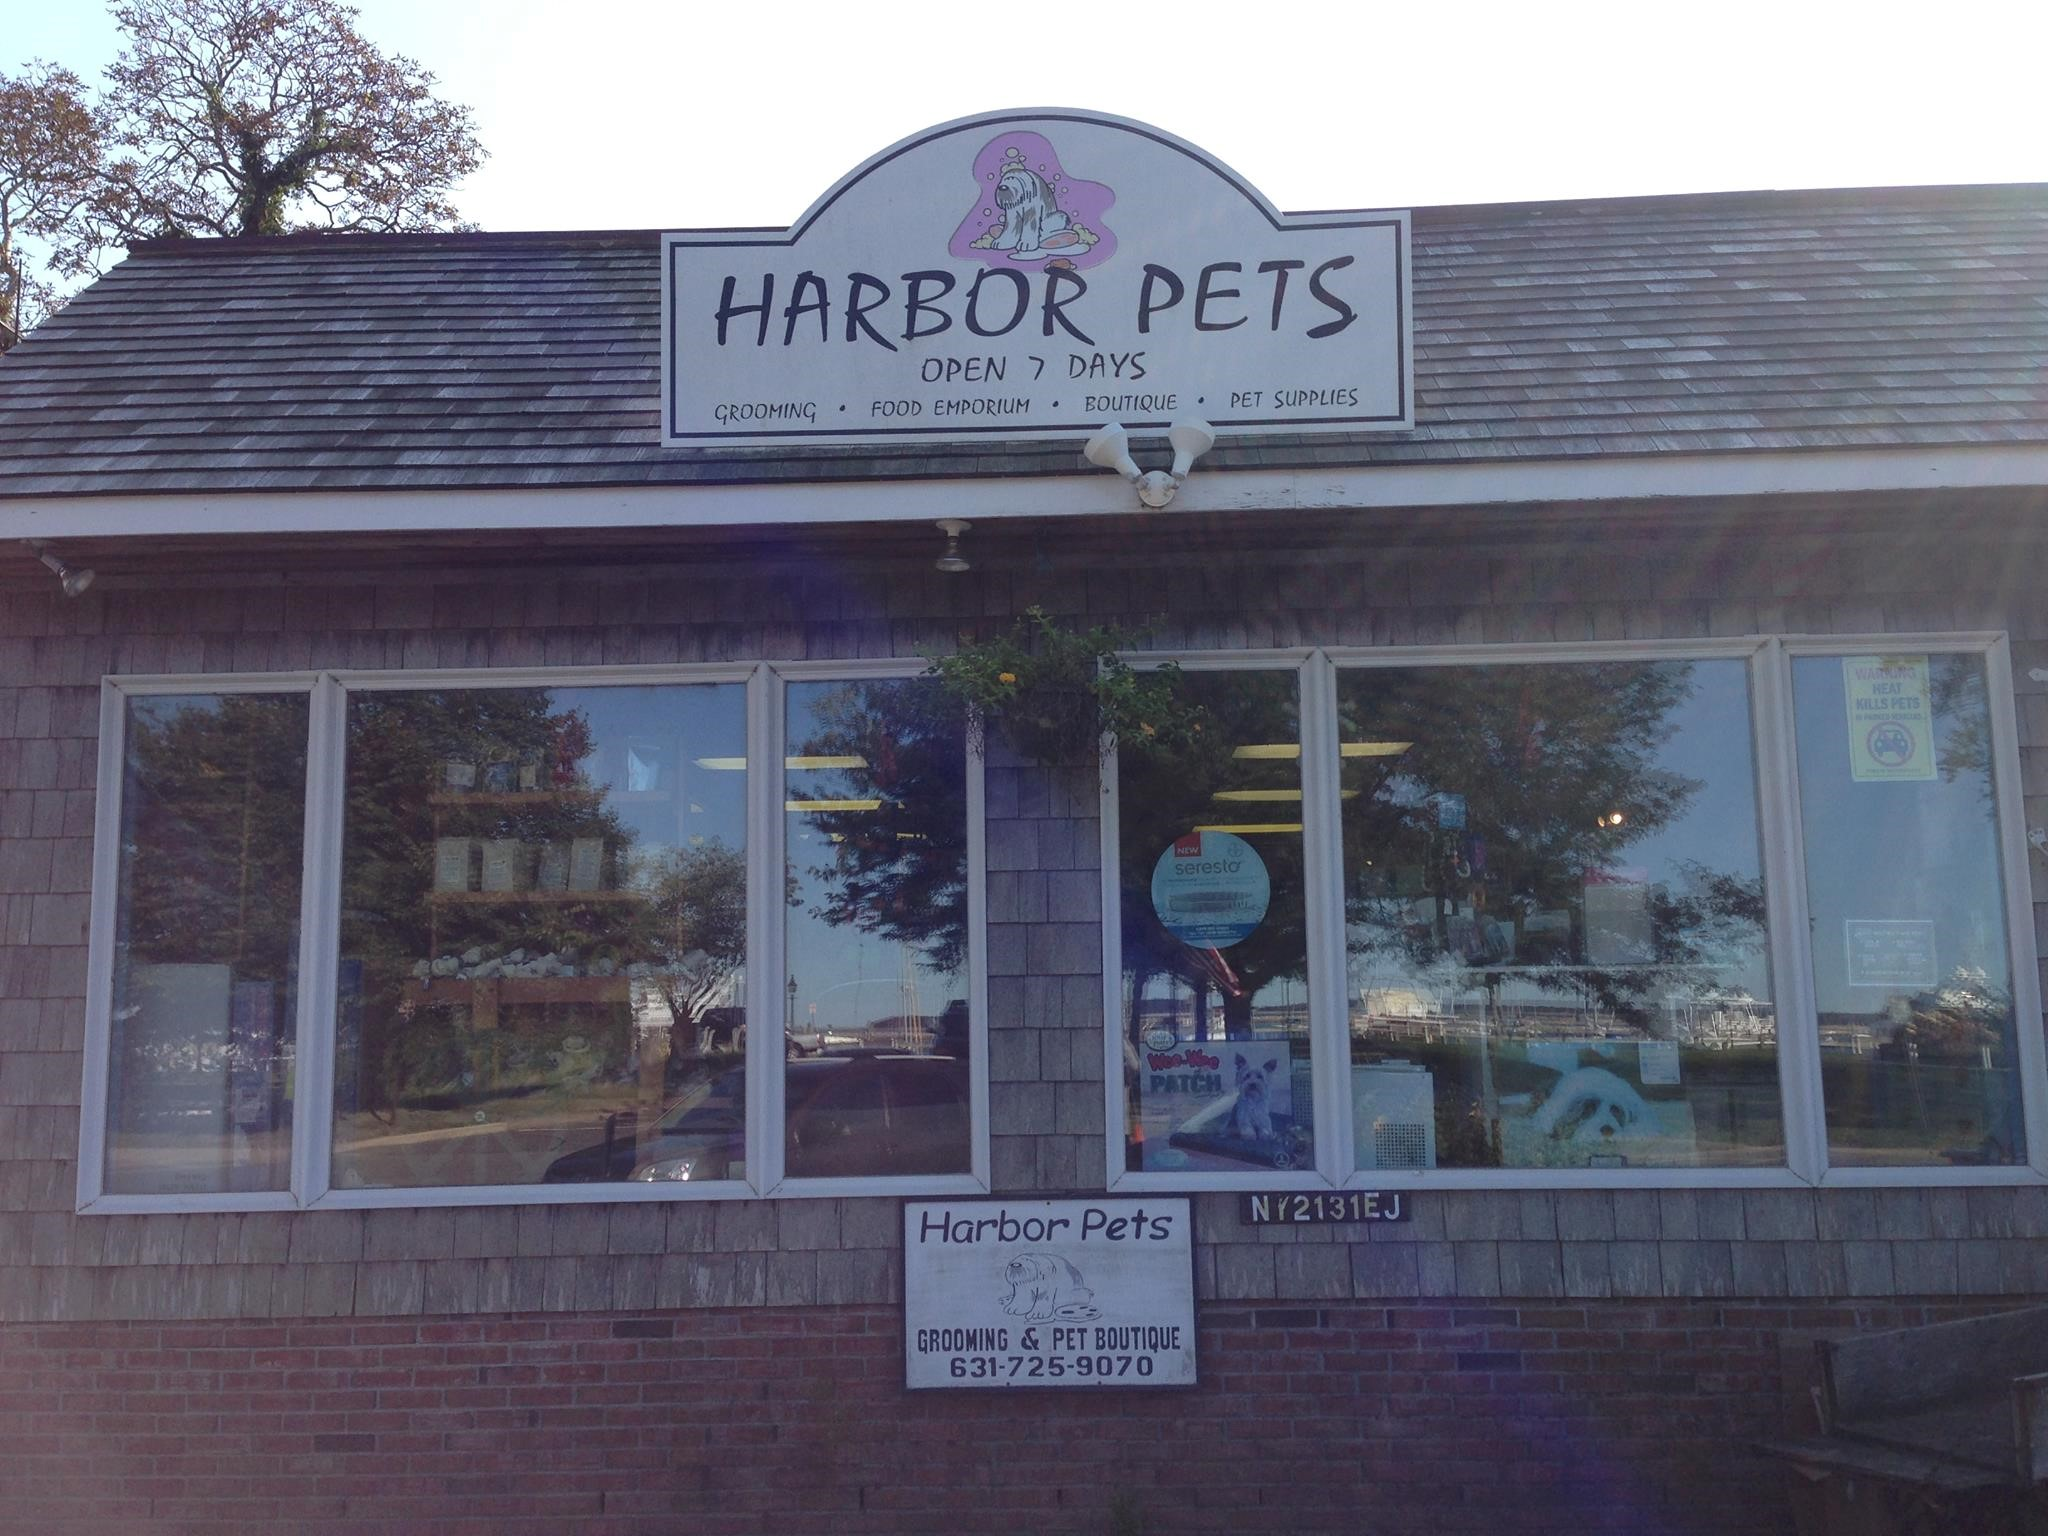 Harbor Pets